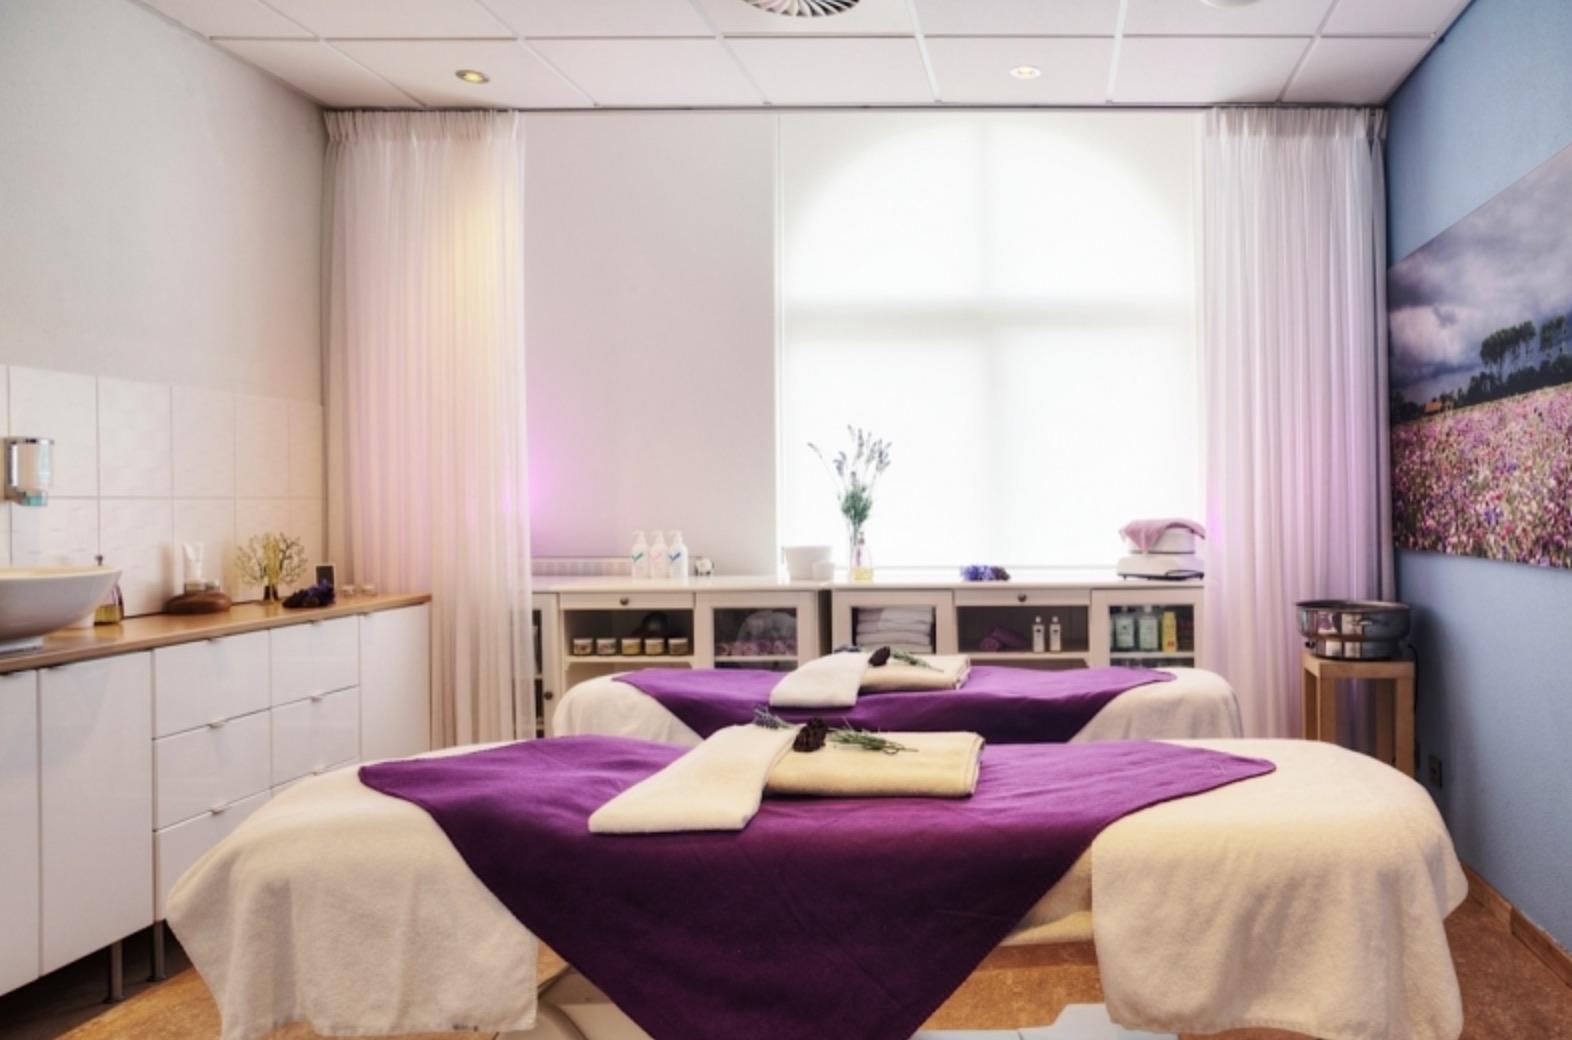 Badhotel Spa VisitDomburg - foto van wellness ruimte binnen